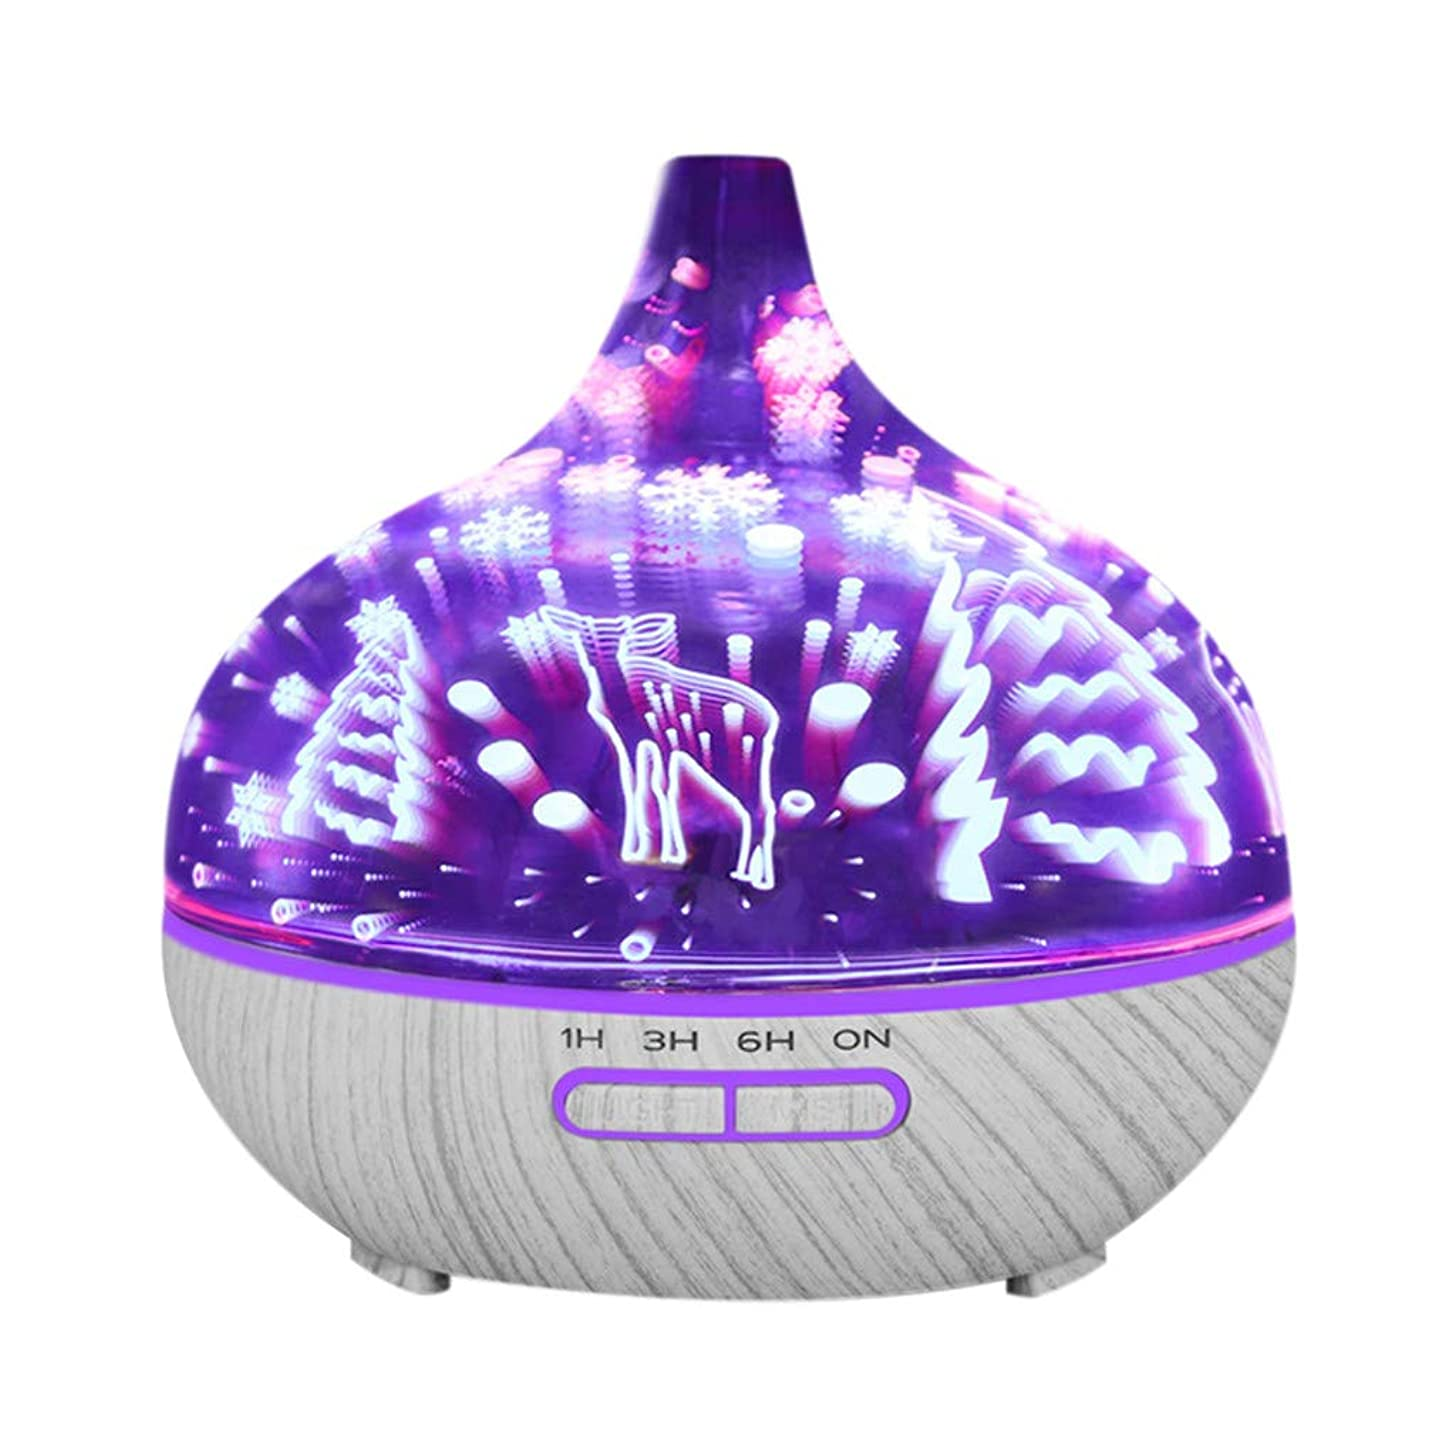 Ultrasonic Aroma Humidifier,3D Night Light Ultrasonic Aroma Diffuser Essential Oil Humidifier Aromatherapy,Essential Oil Diffuser Two Pack,C,16.5x16